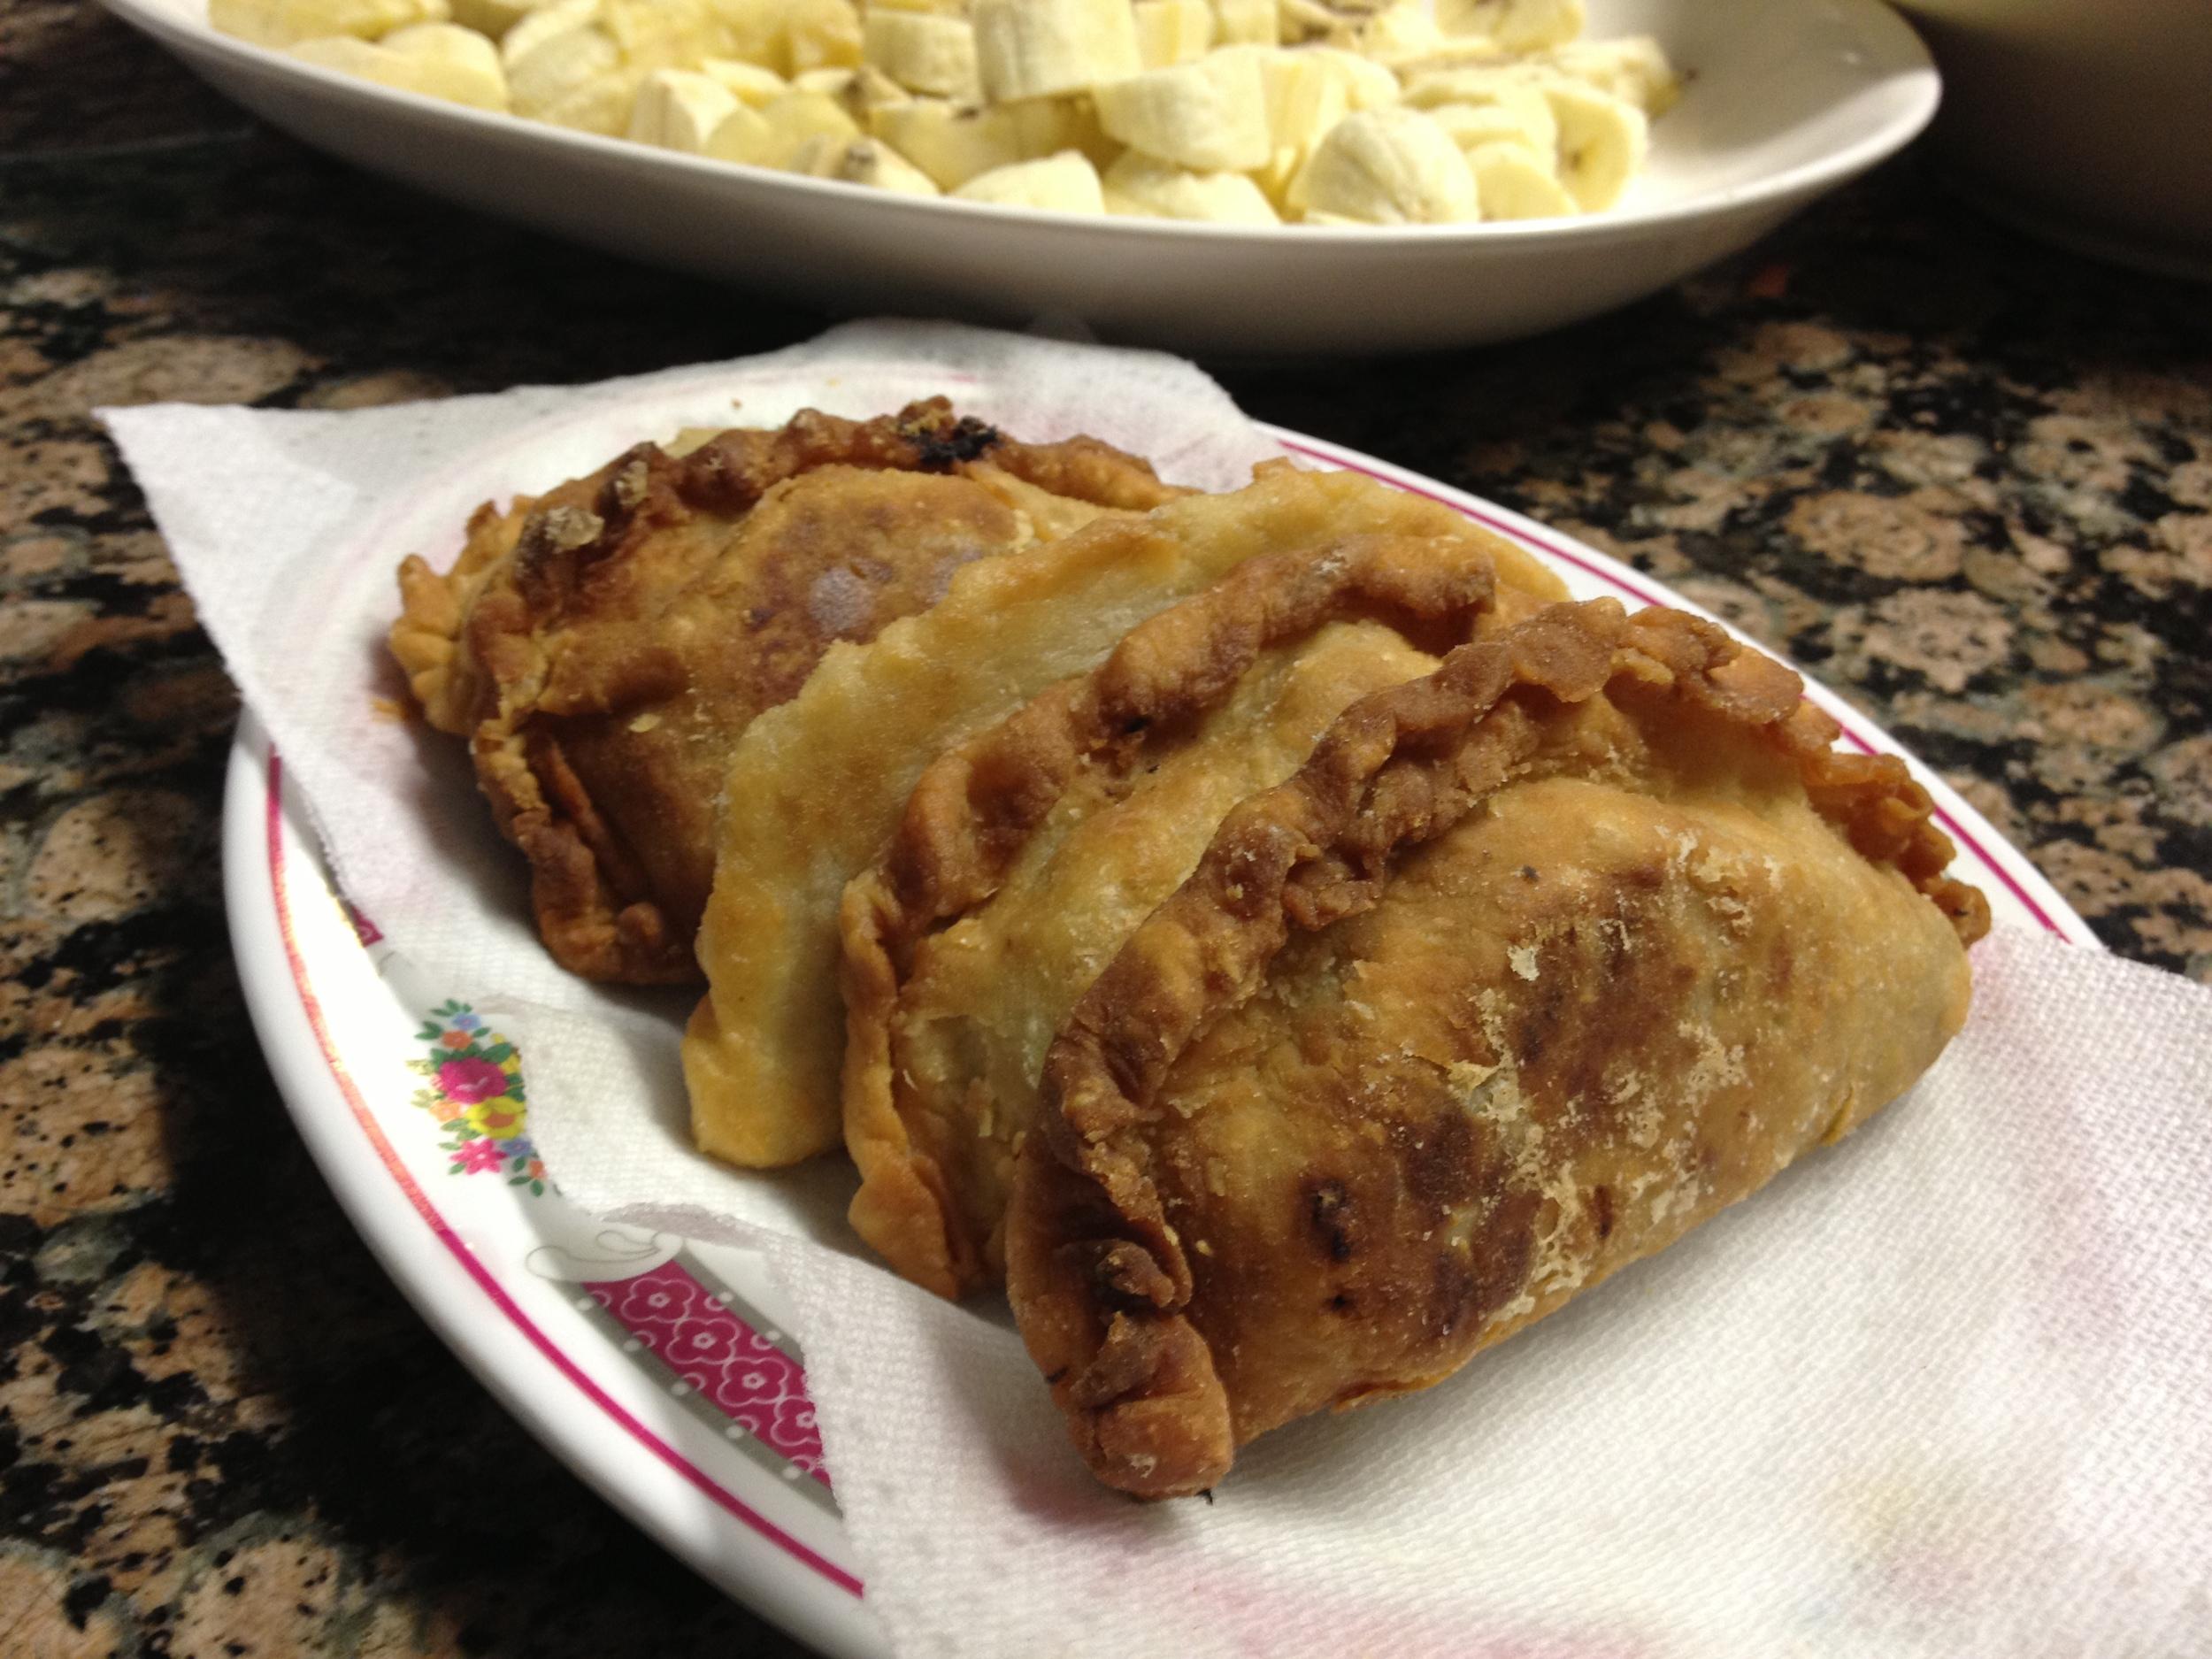 tita elo's famous empanadas, fresh from the pan. yum.